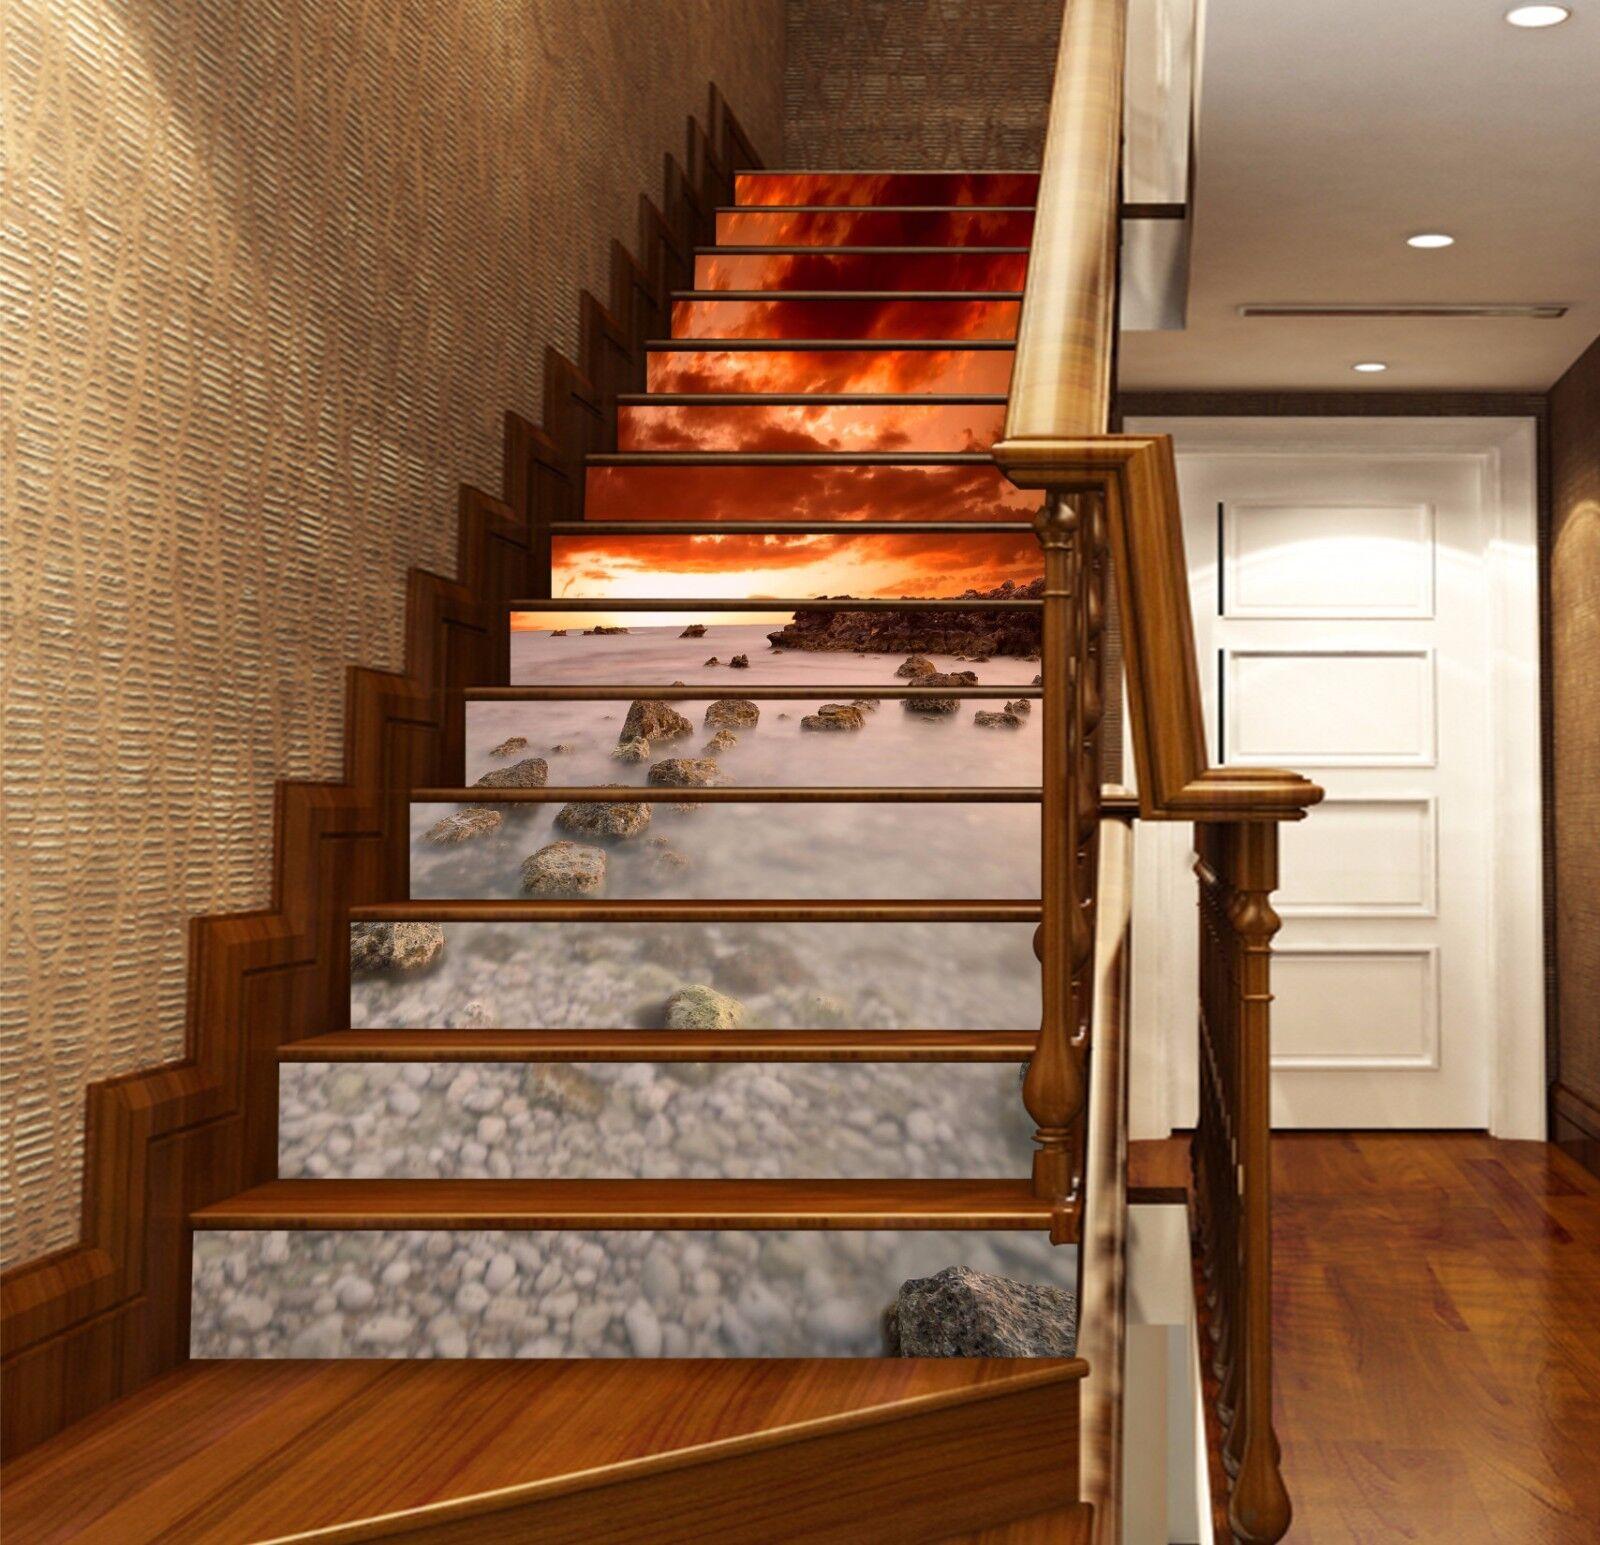 3D Sauber Meer 8244 Stair Risers Dekoration Fototapete Vinyl Aufkleber Tapete DE